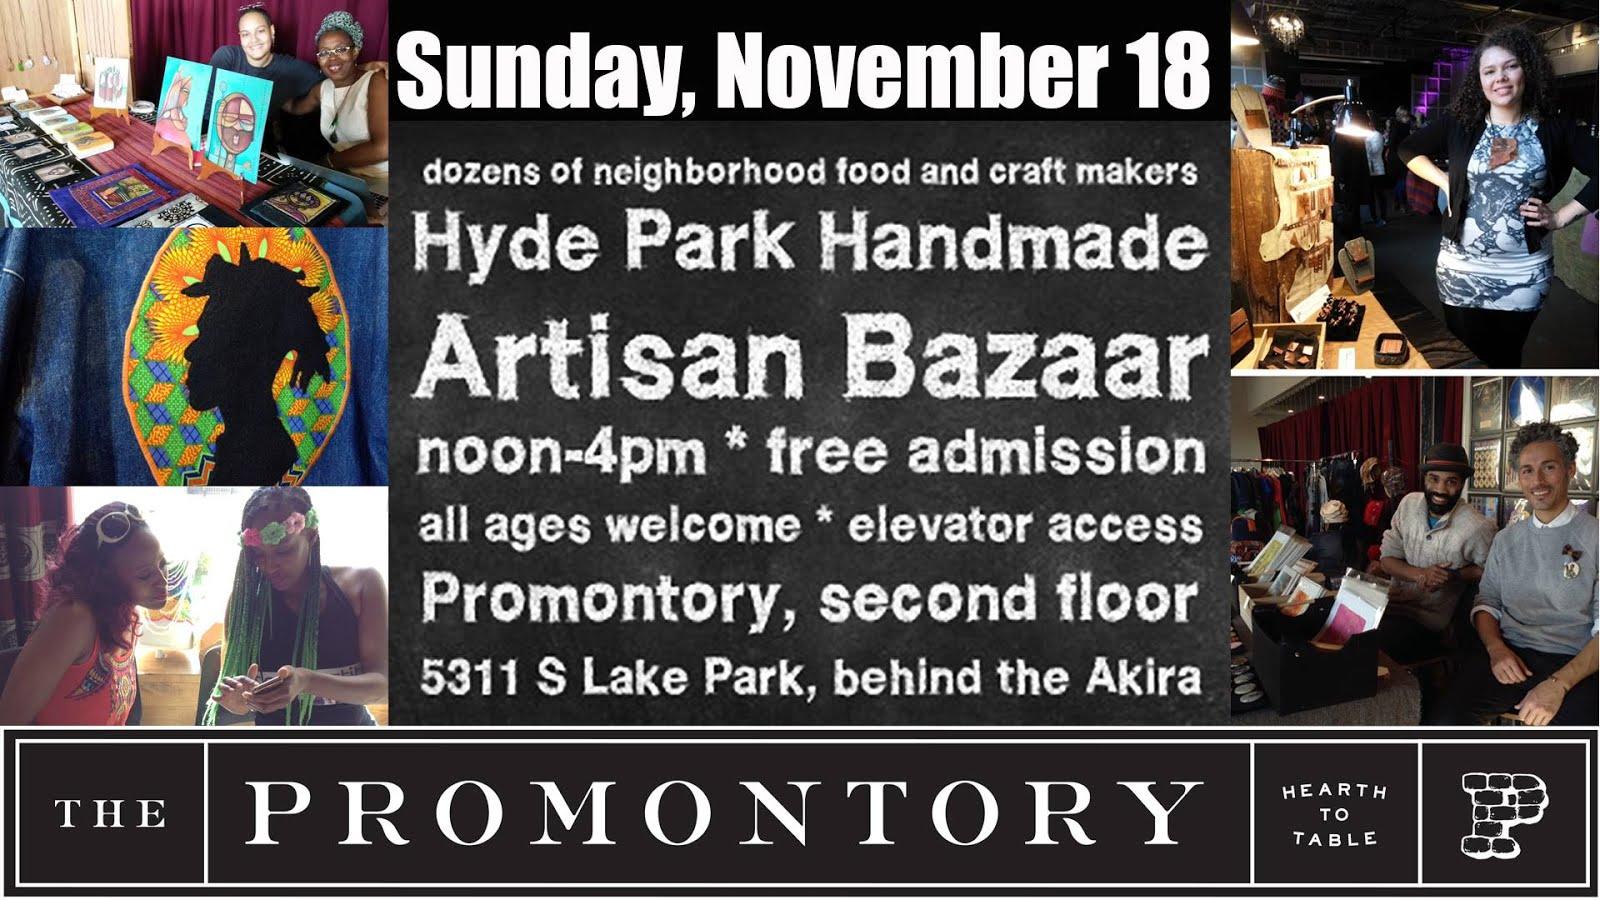 Sunday 11/18: Hyde Park Handmade Artisan Bazaar @ The Promontory